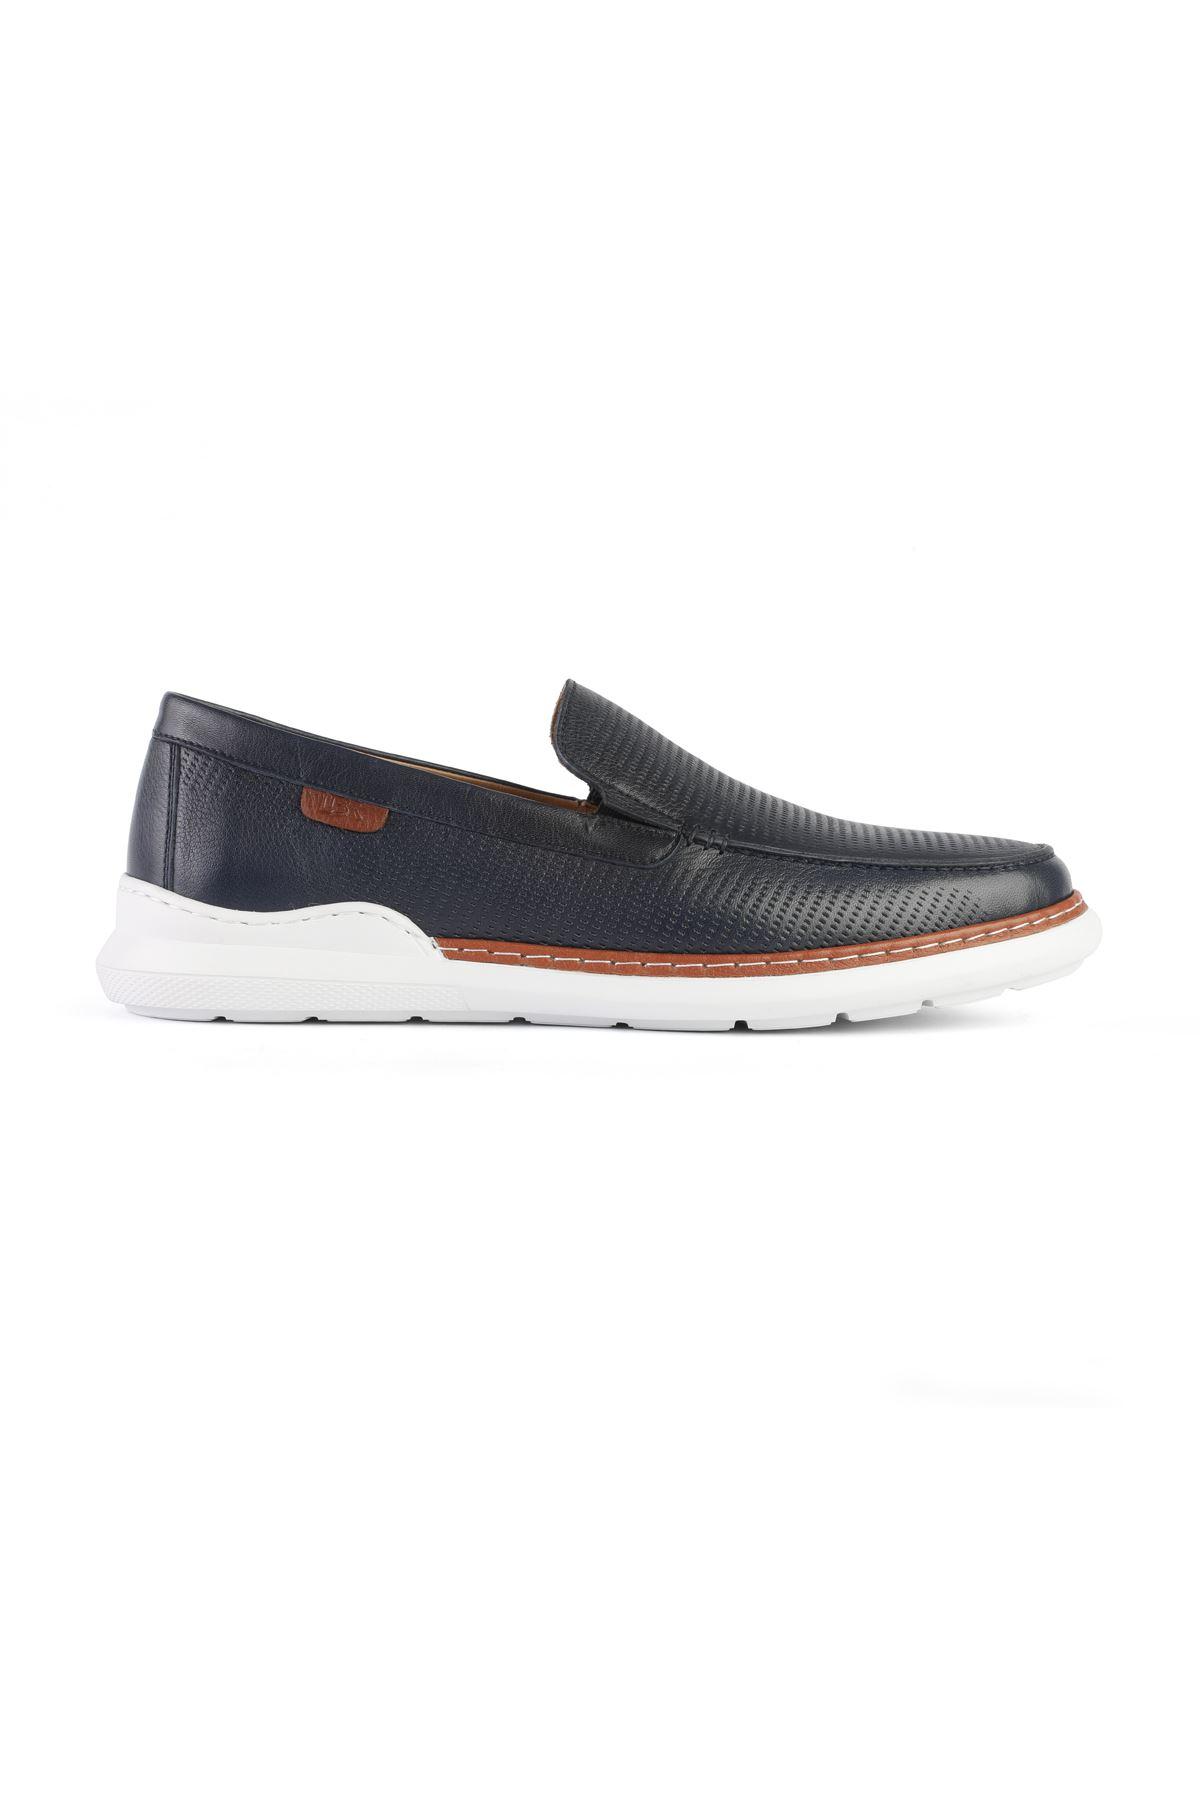 Libero 3332 Lacivert Loafer Ayakkabı